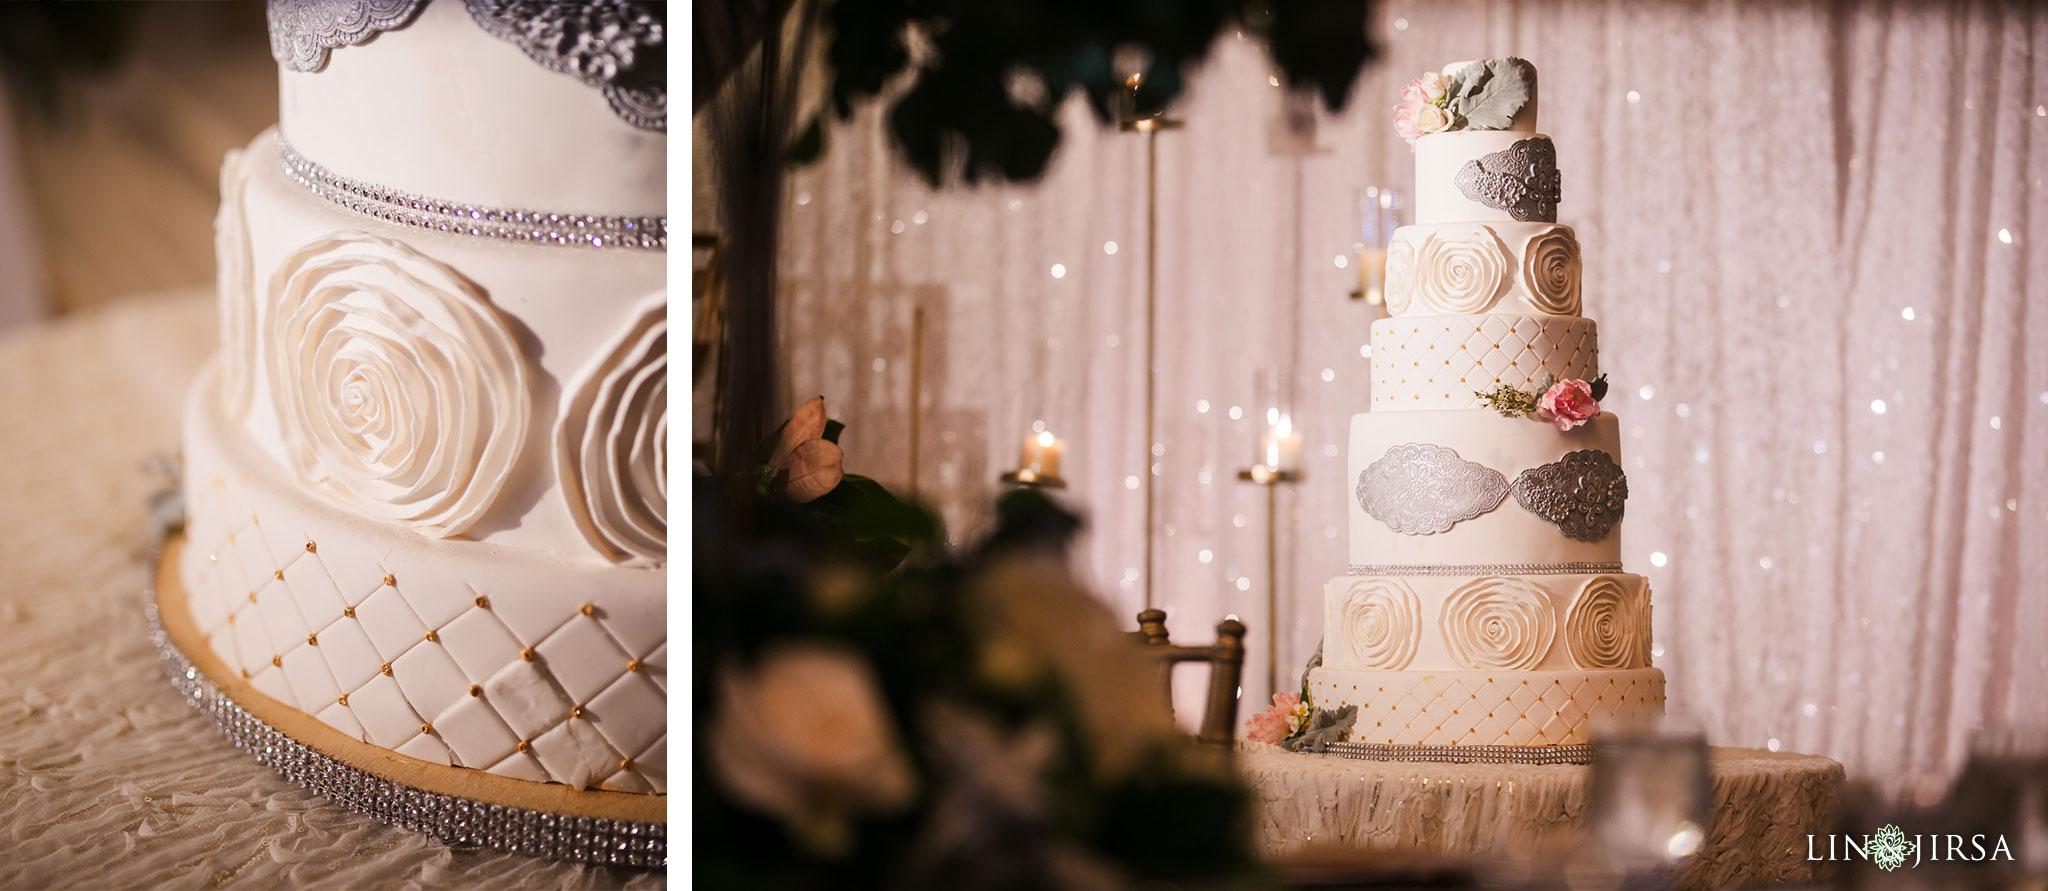 027 san jose marriott indian wedding photography